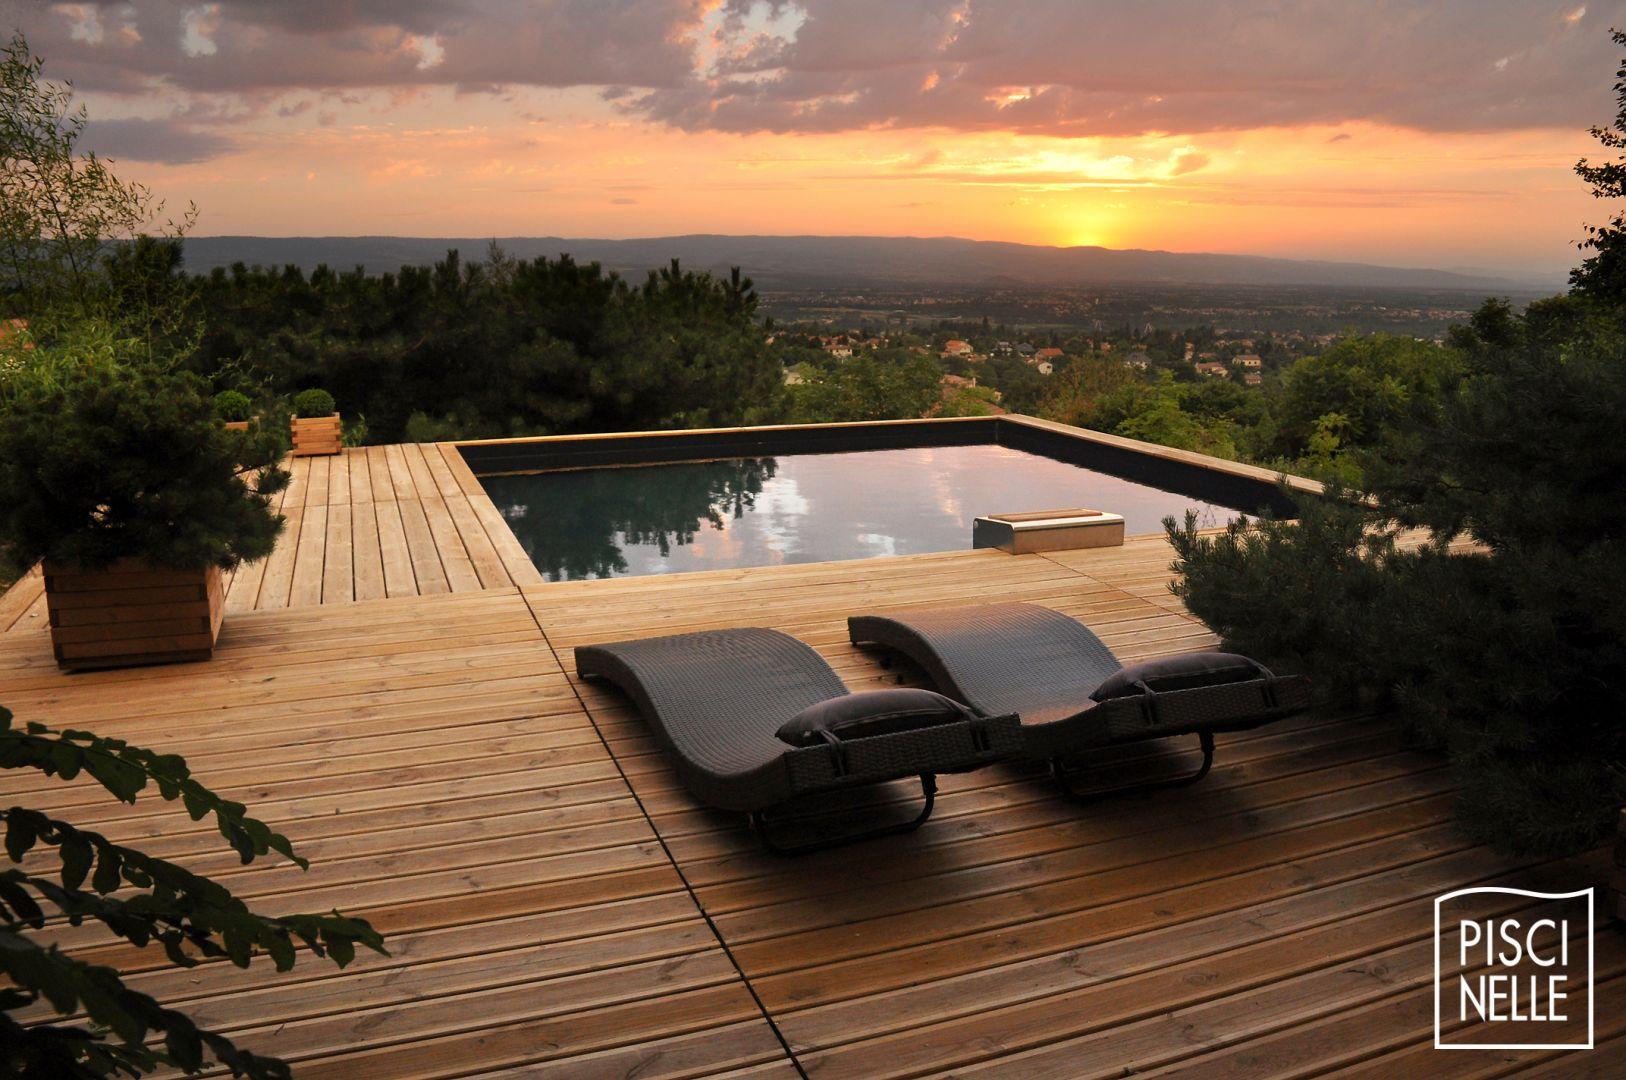 Mettre Piscine Sur Terrain En Pente piscine hors-sol - piscinelle